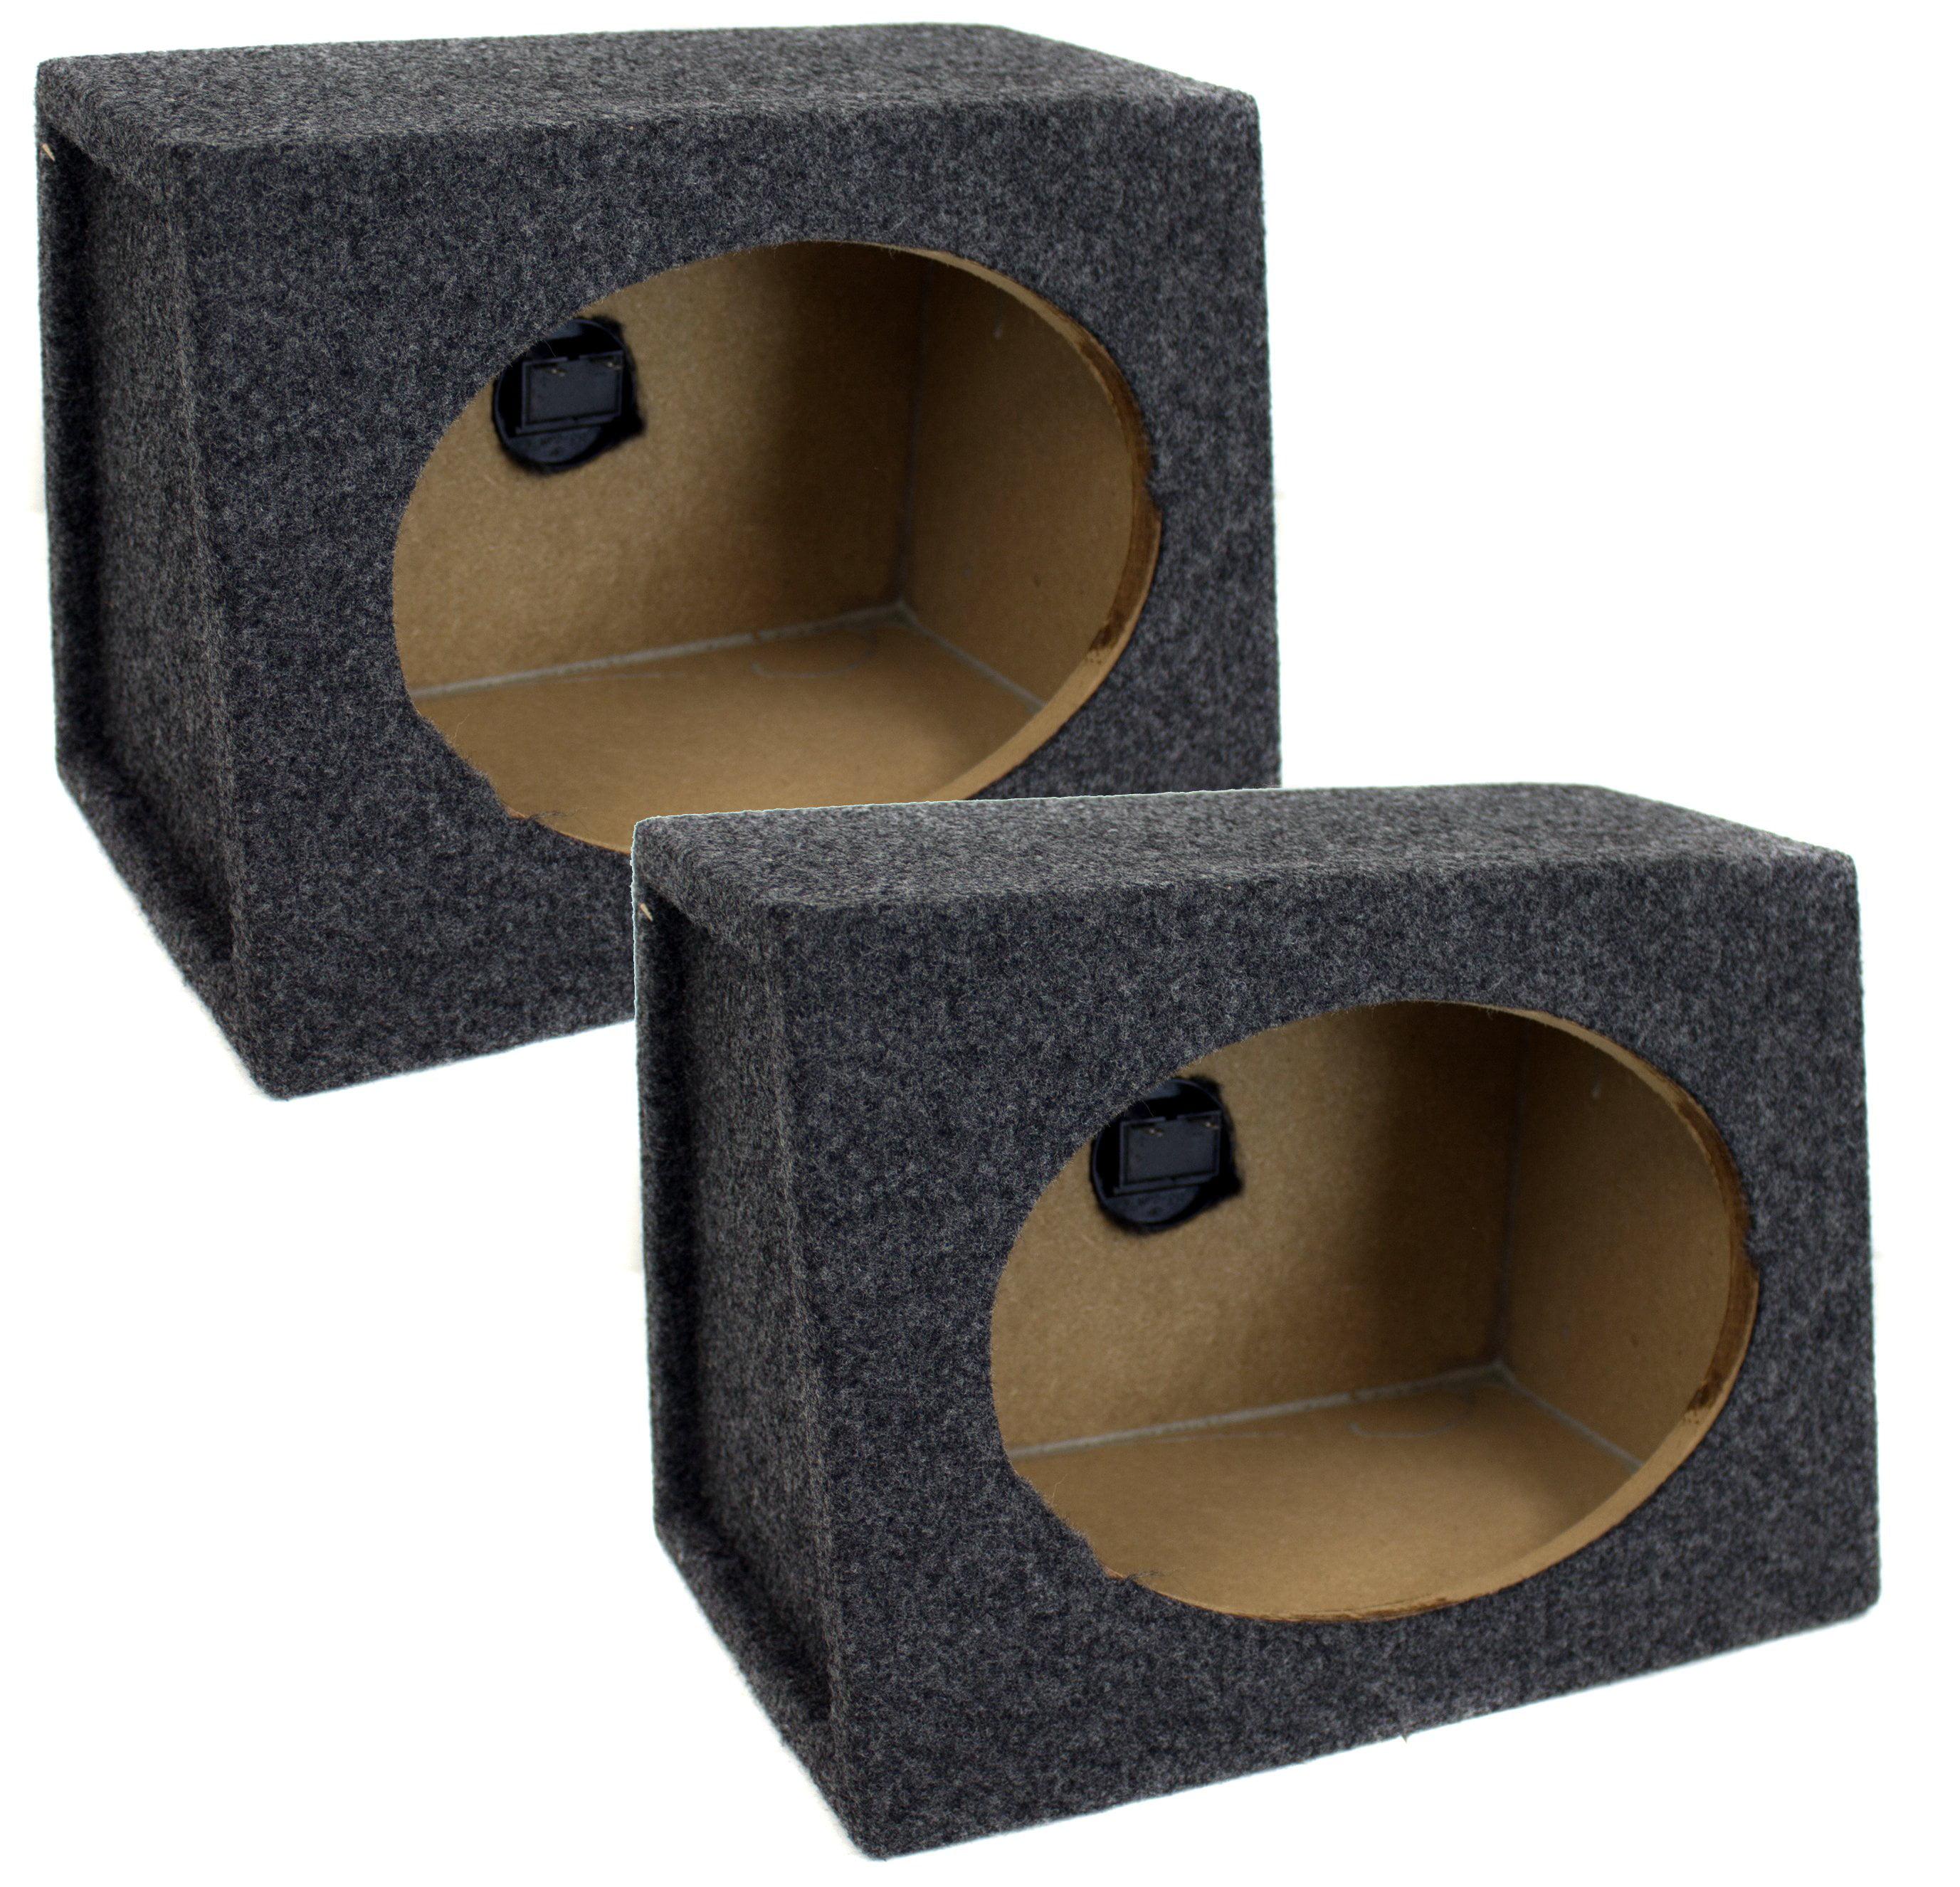 Q Power Angled Style 6 x 9 Inch Car Audio Speaker Box Enclosures, 2 Speakers